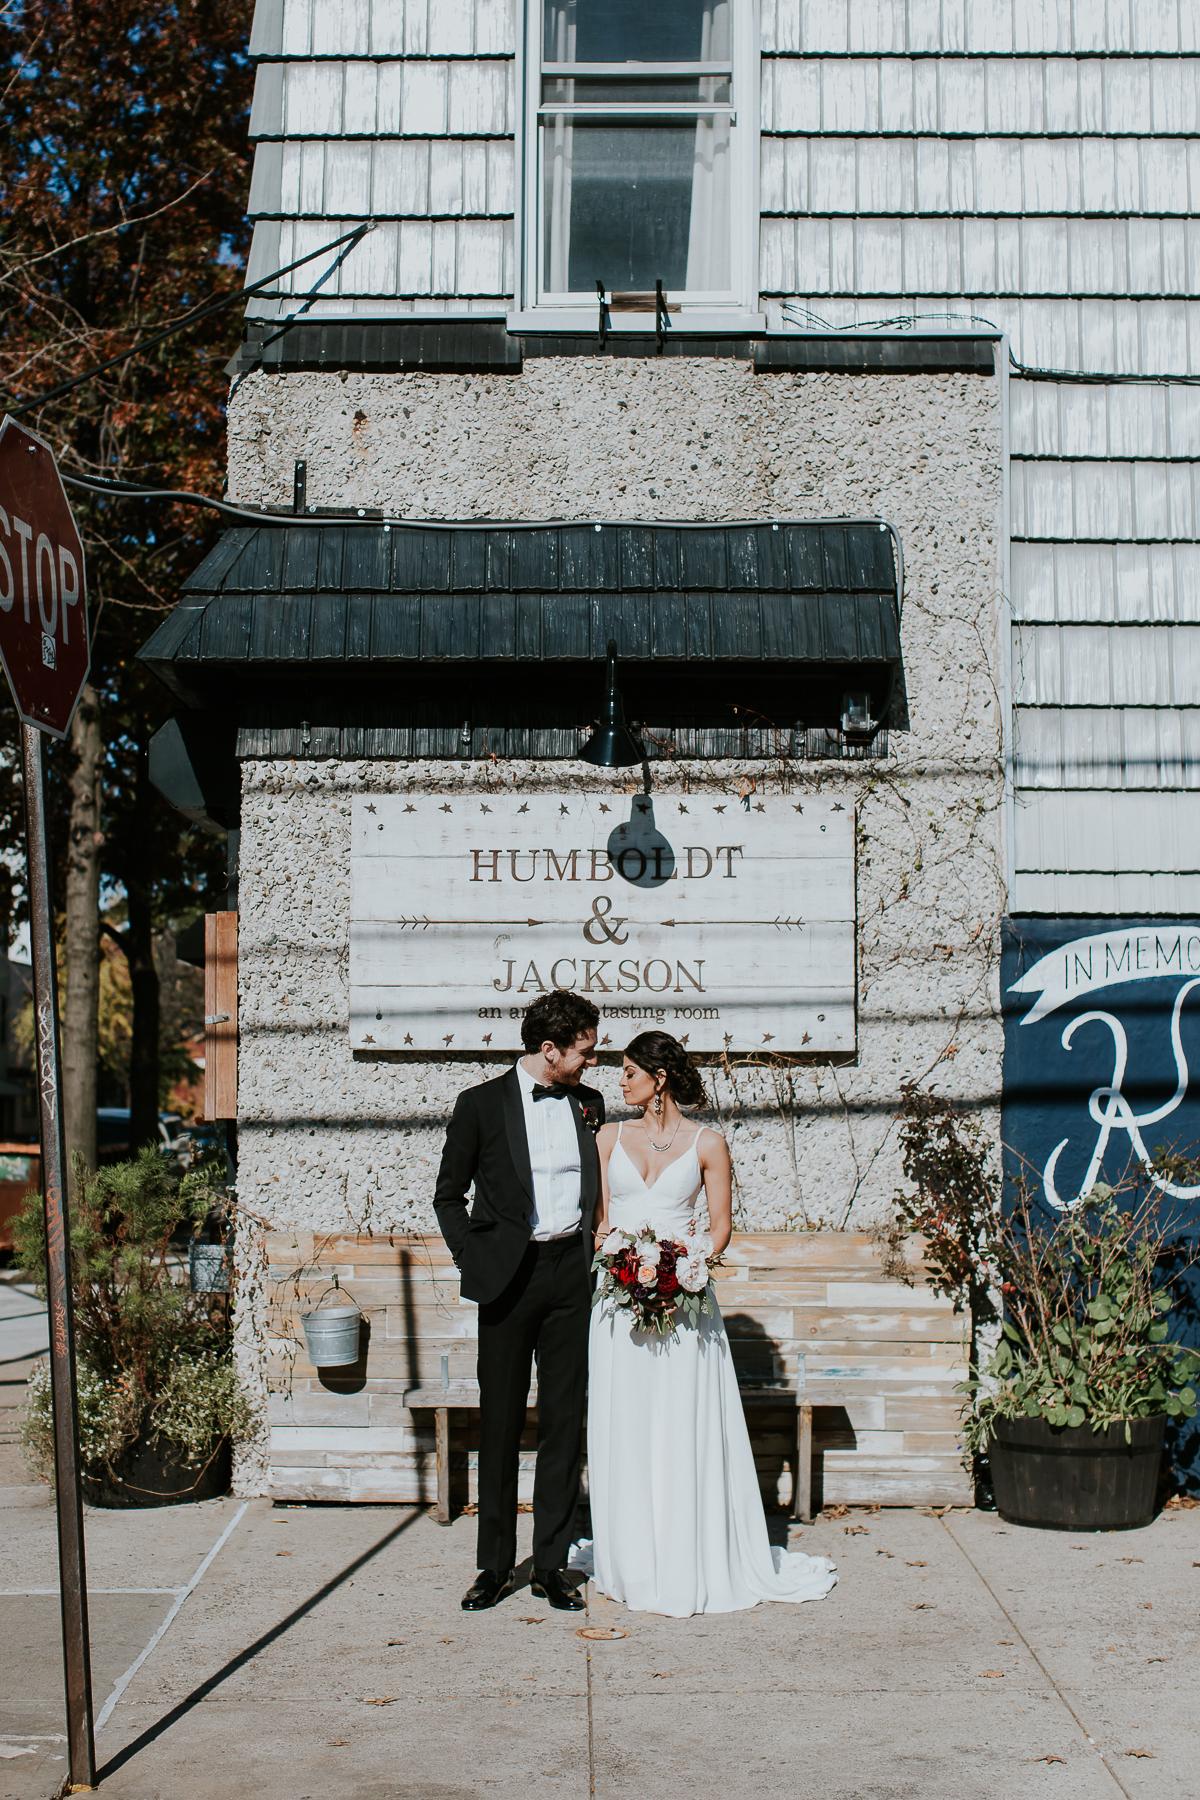 Humboldt-&-Jackson-Restaurant-Intimate-Brooklyn-Documentary-Wedding-Photographer-42.jpg